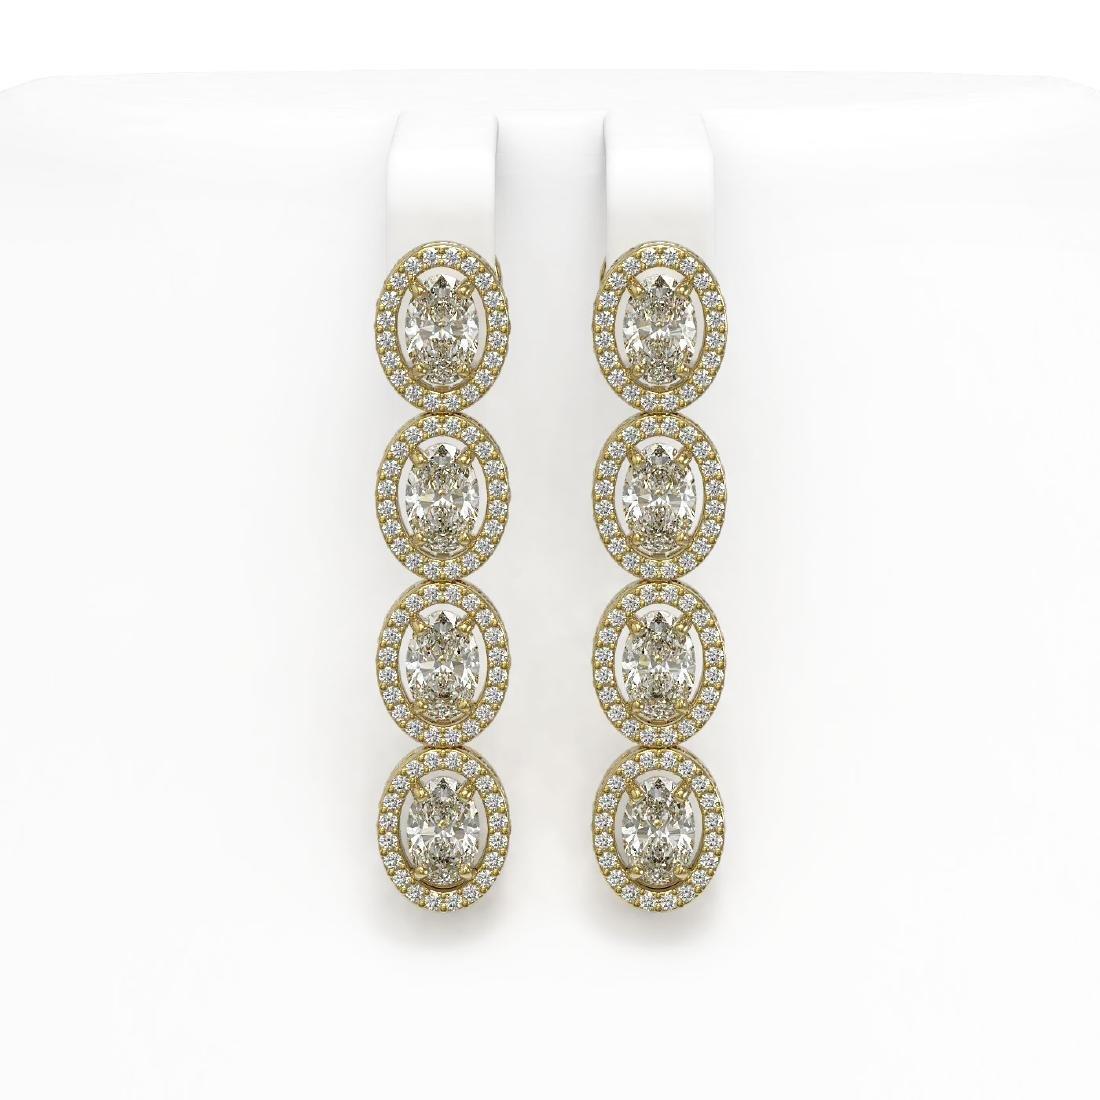 6.08 CTW Oval Diamond Designer Earrings 18K Yellow Gold